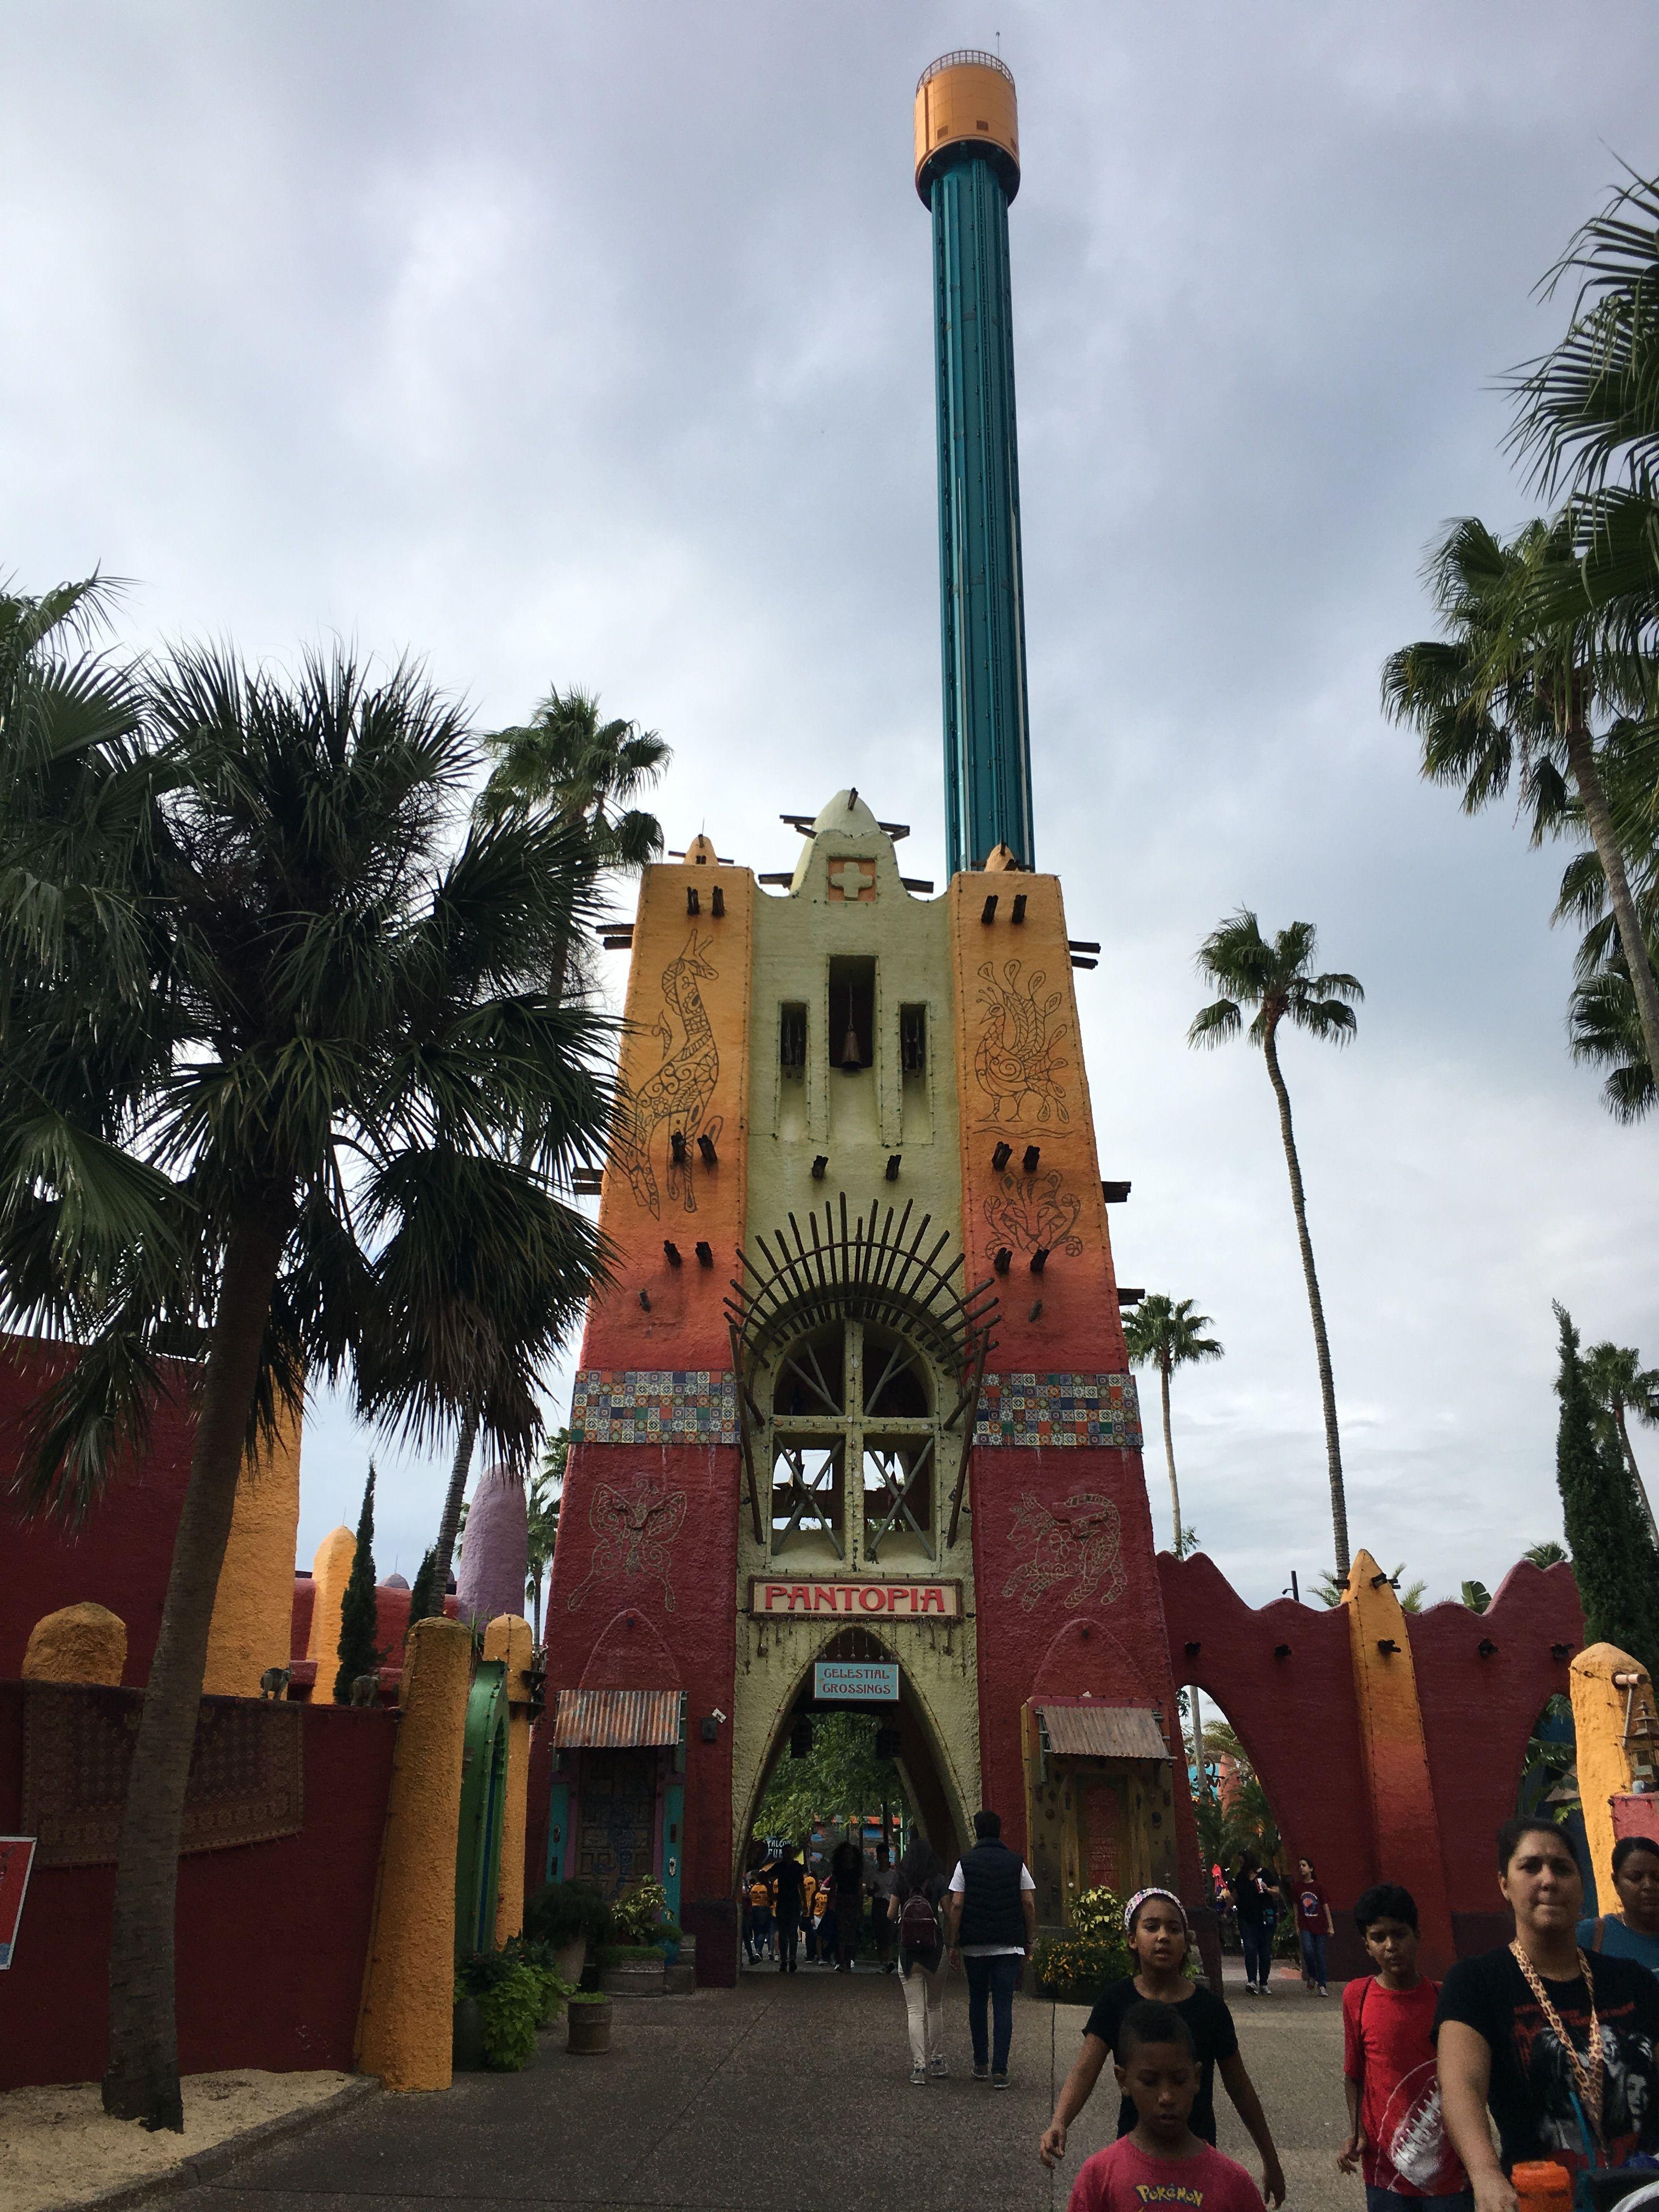 9894e546356310eb1c39fff43641b0de - Is Busch Gardens Open On Thanksgiving Day